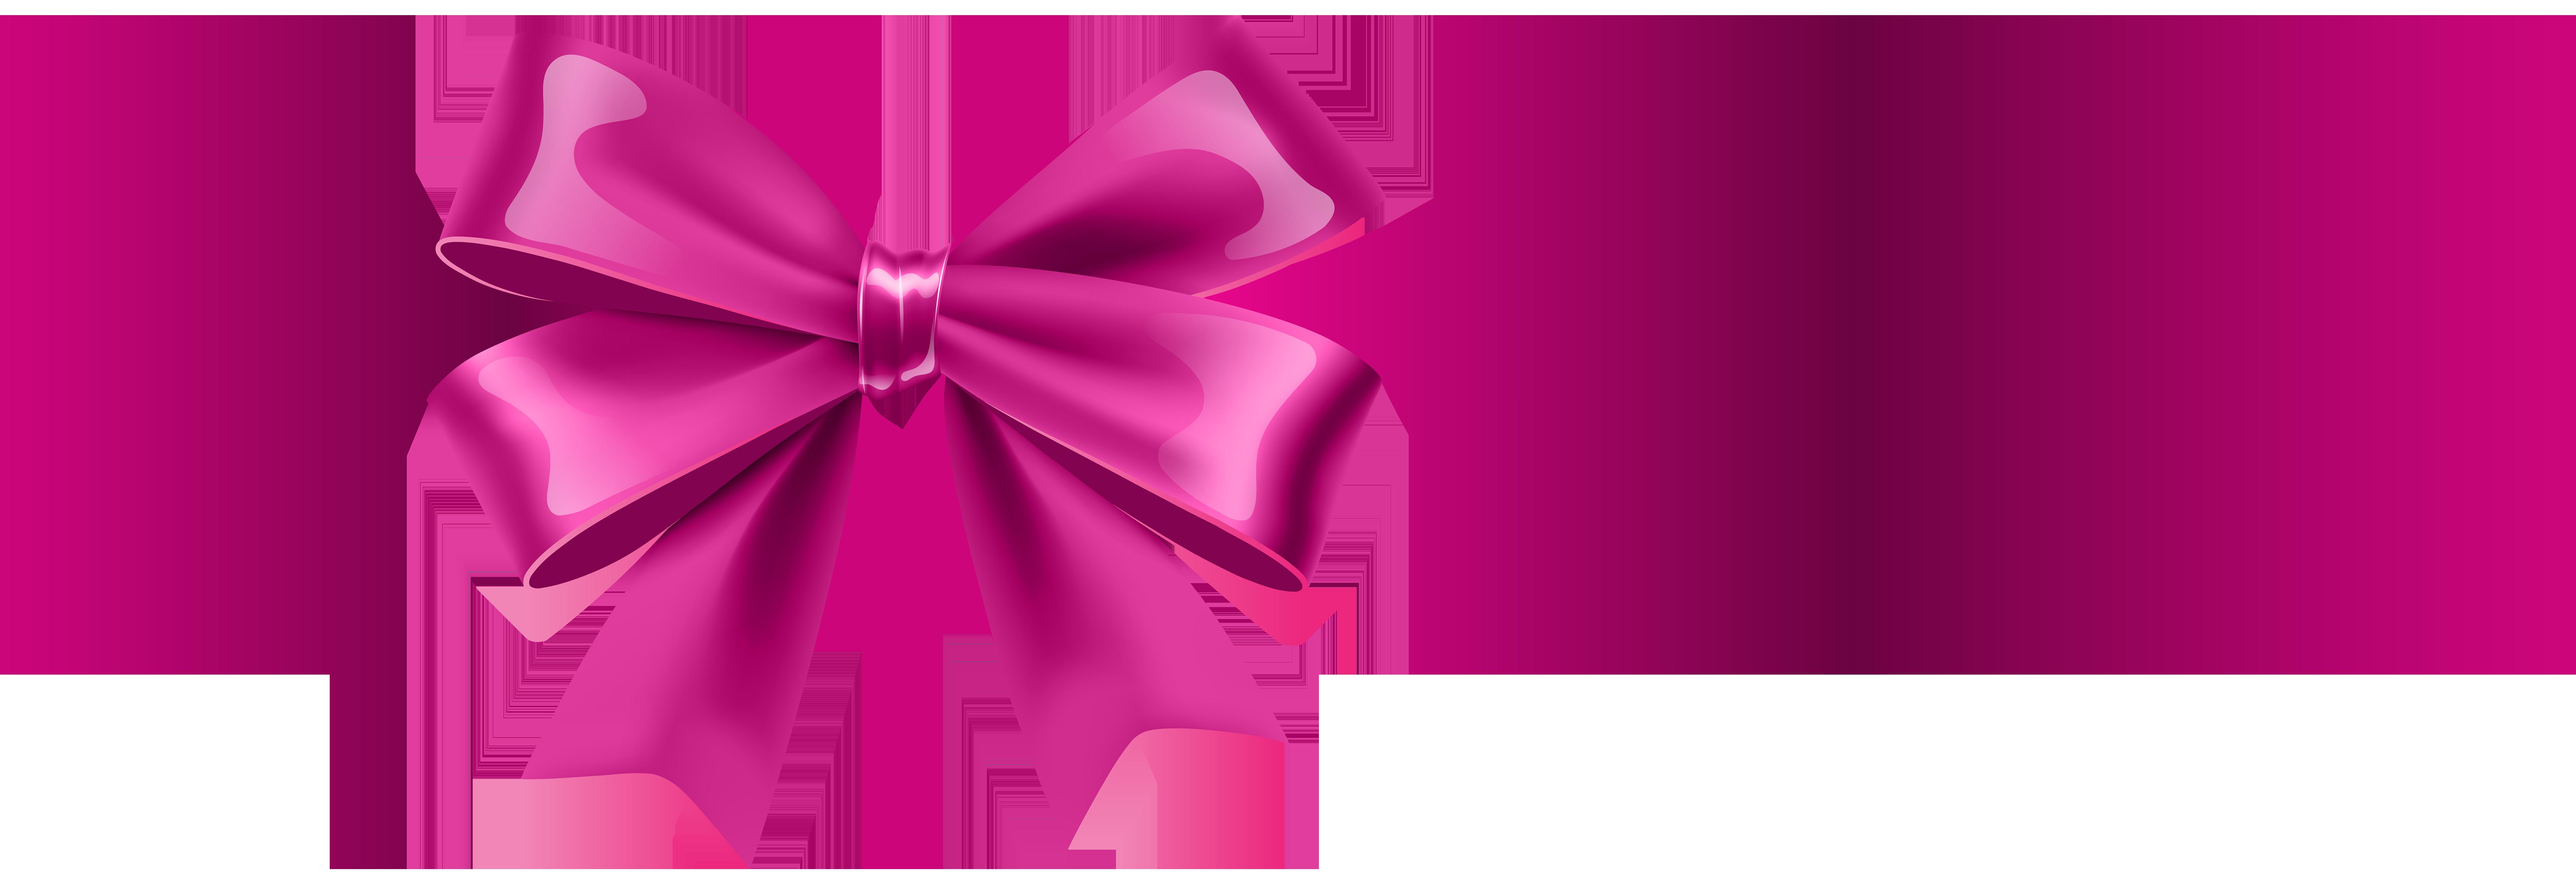 svg Pink Bow Transparent Clip Art